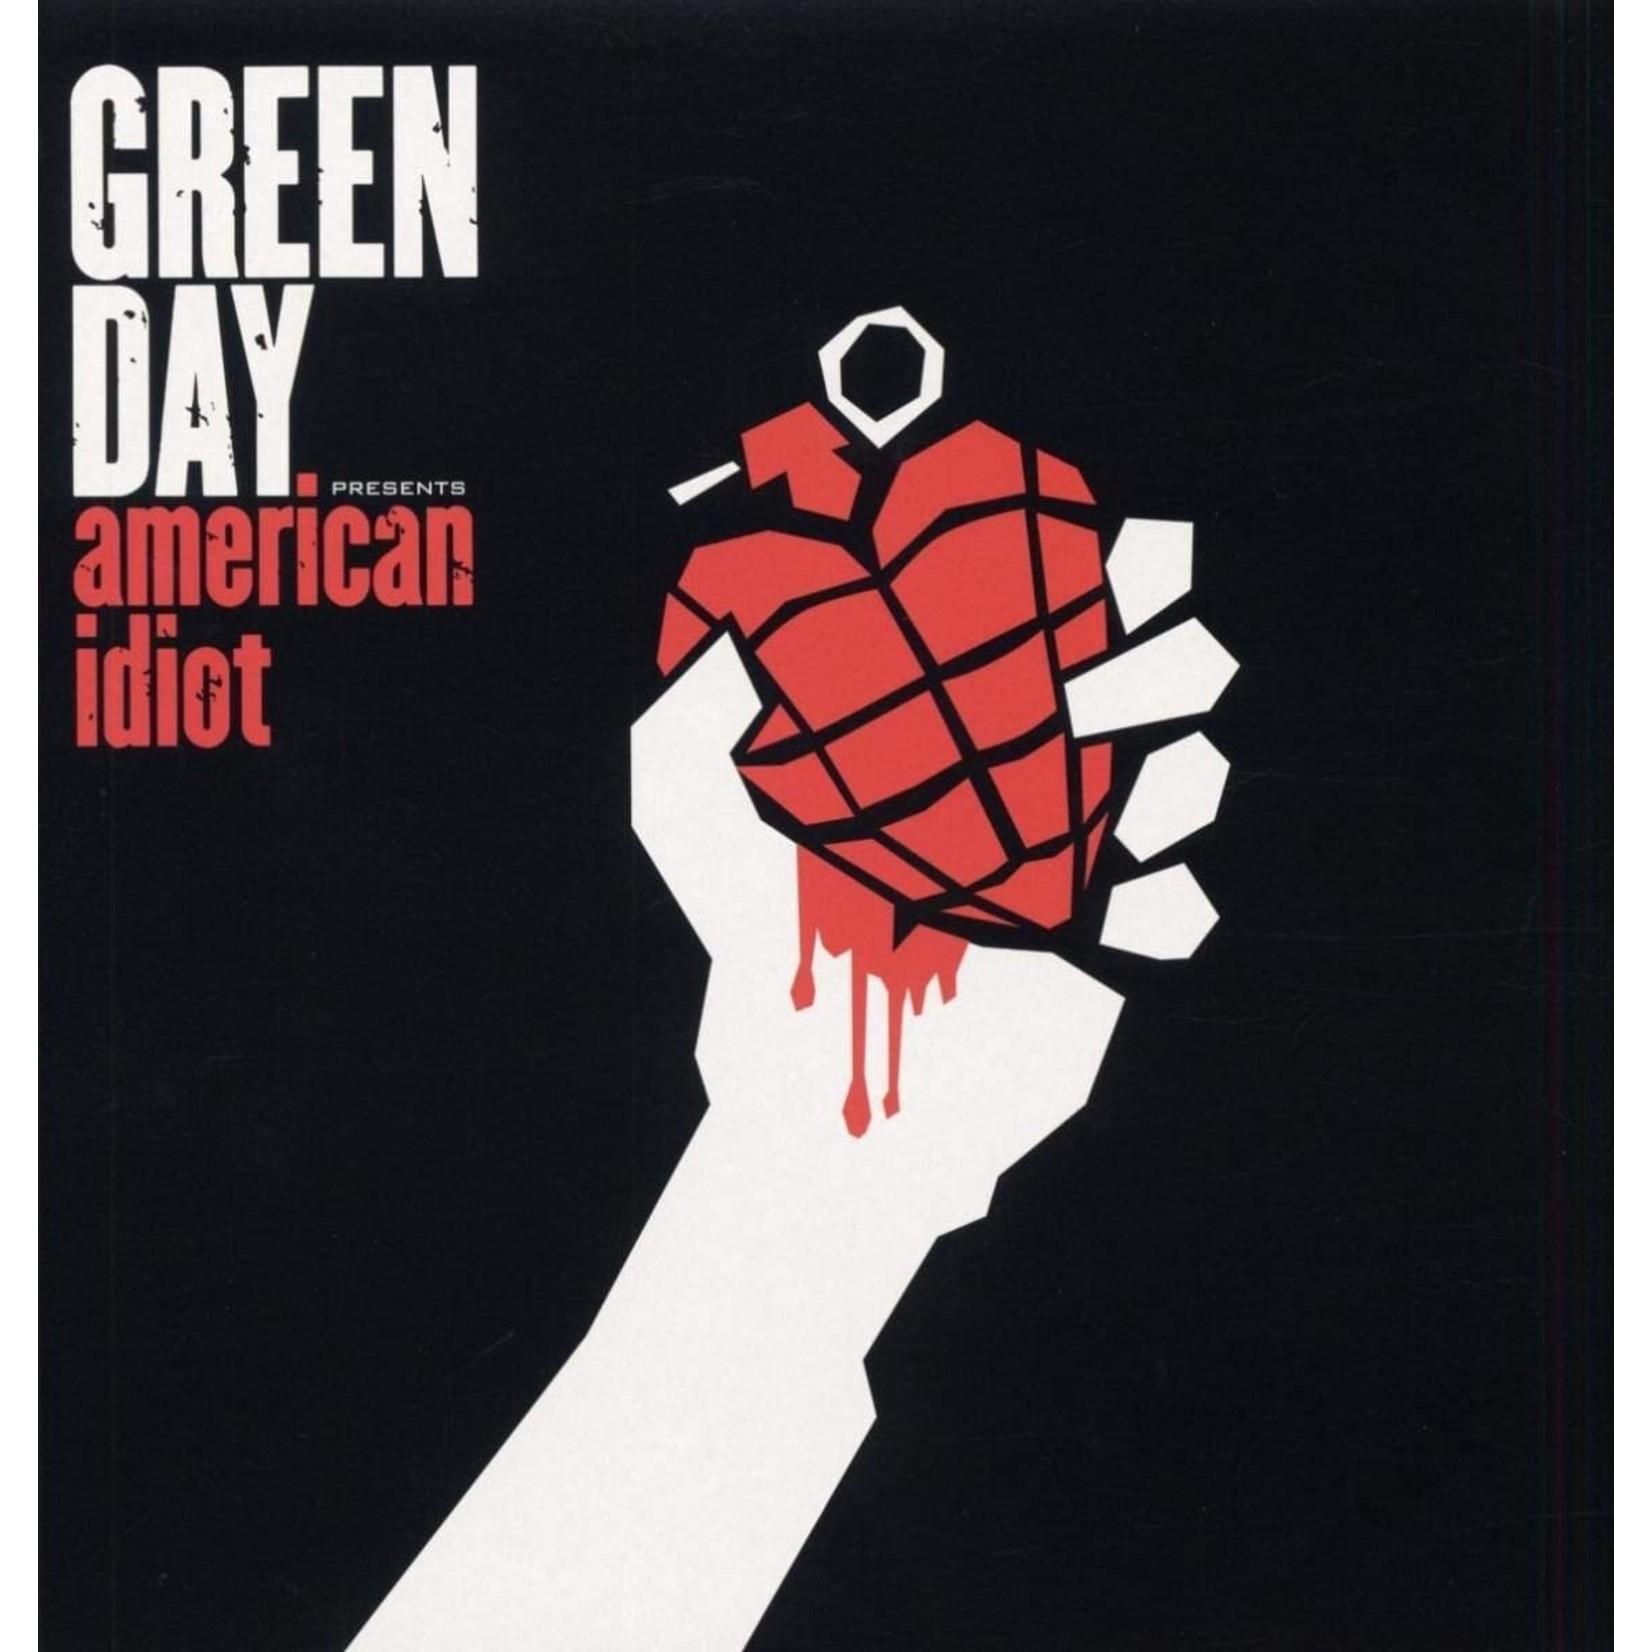 [New] Green Day: American Idiot (mixed colour vinyl)